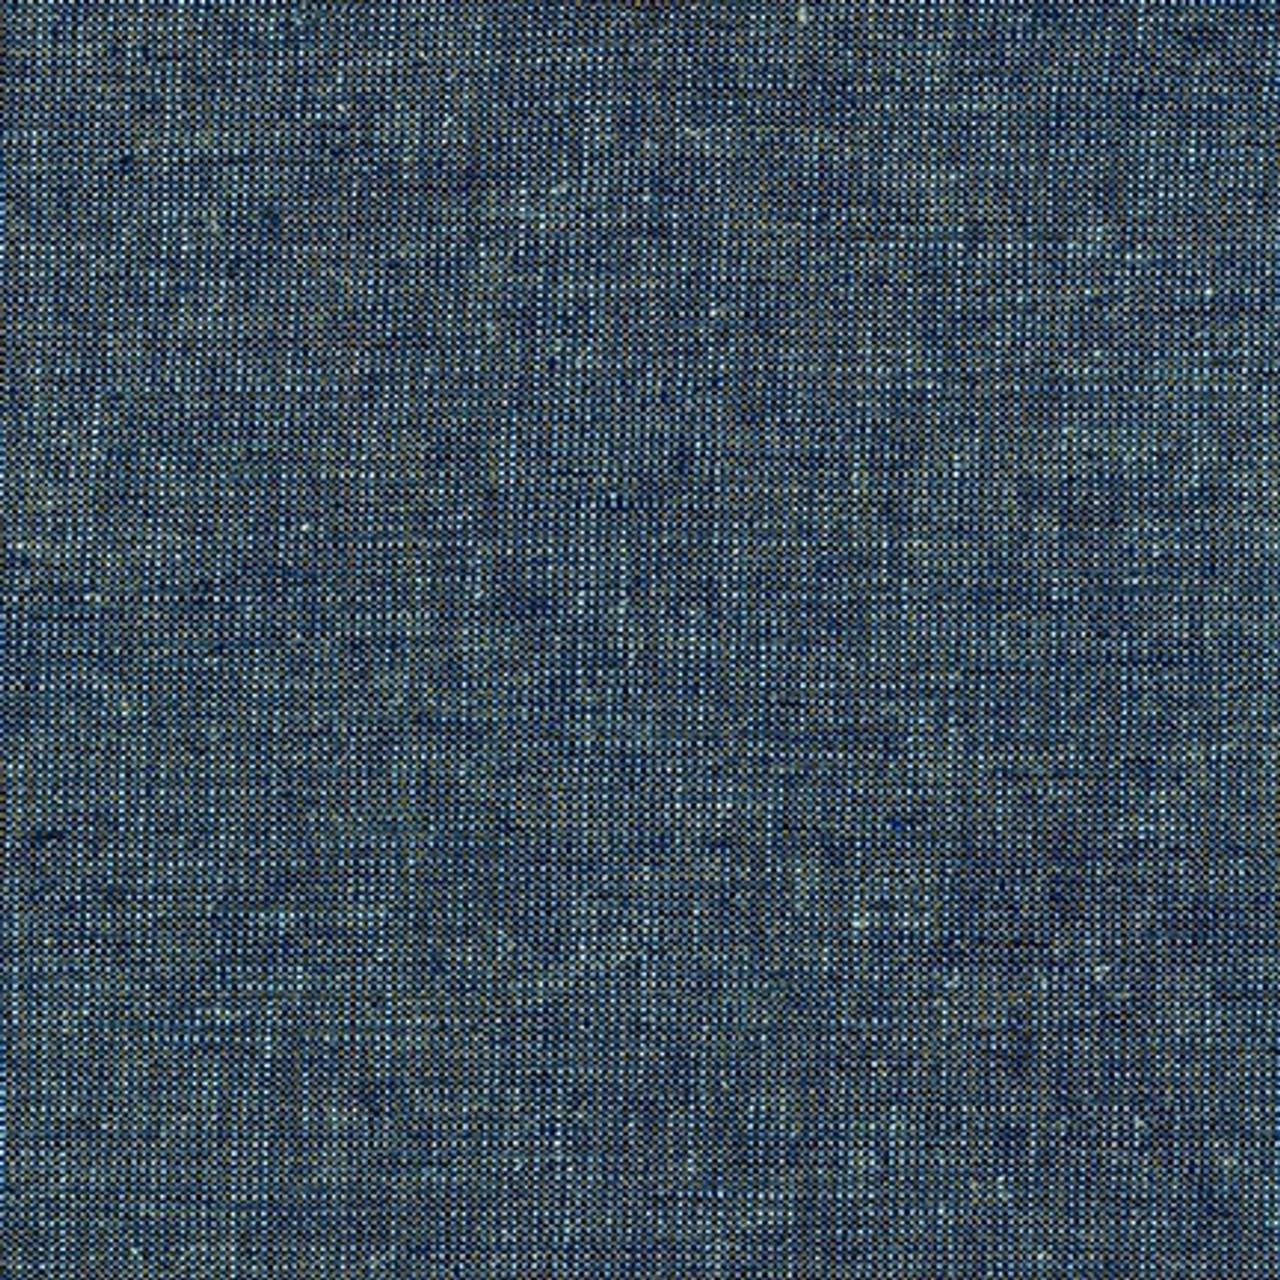 Essex Yarn Dyed Metallic - Ocean